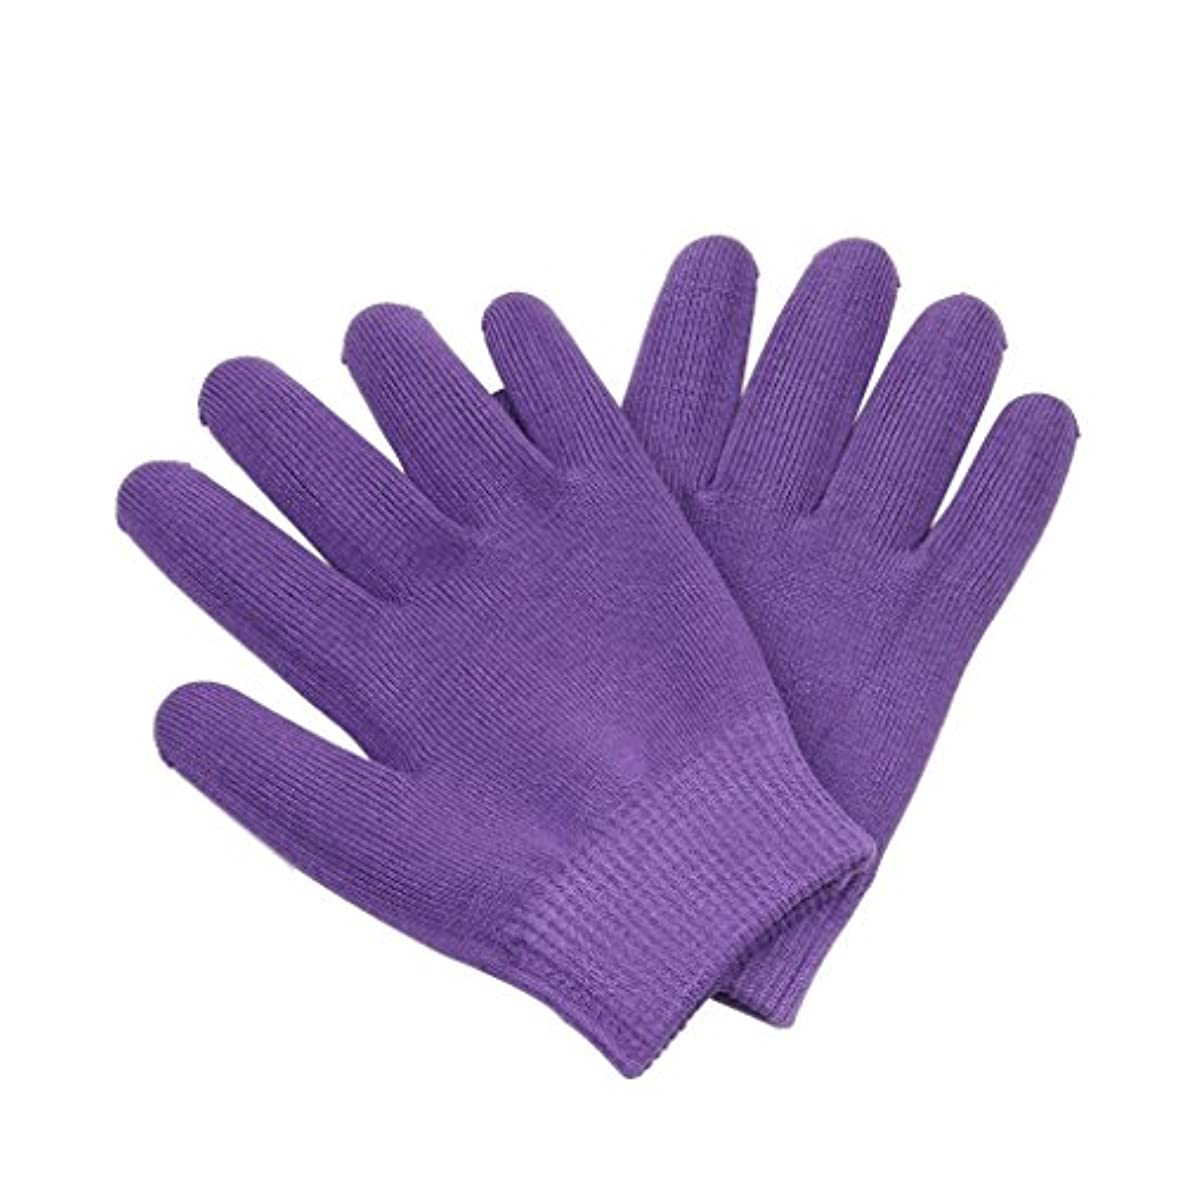 SONONIA 保湿手袋 おやすみ手袋 就寝用 手袋 手湿疹 肌荒れ 乾燥防止 乾燥肌 手荒れ 保湿 スキンケア 全3色選べ - 紫